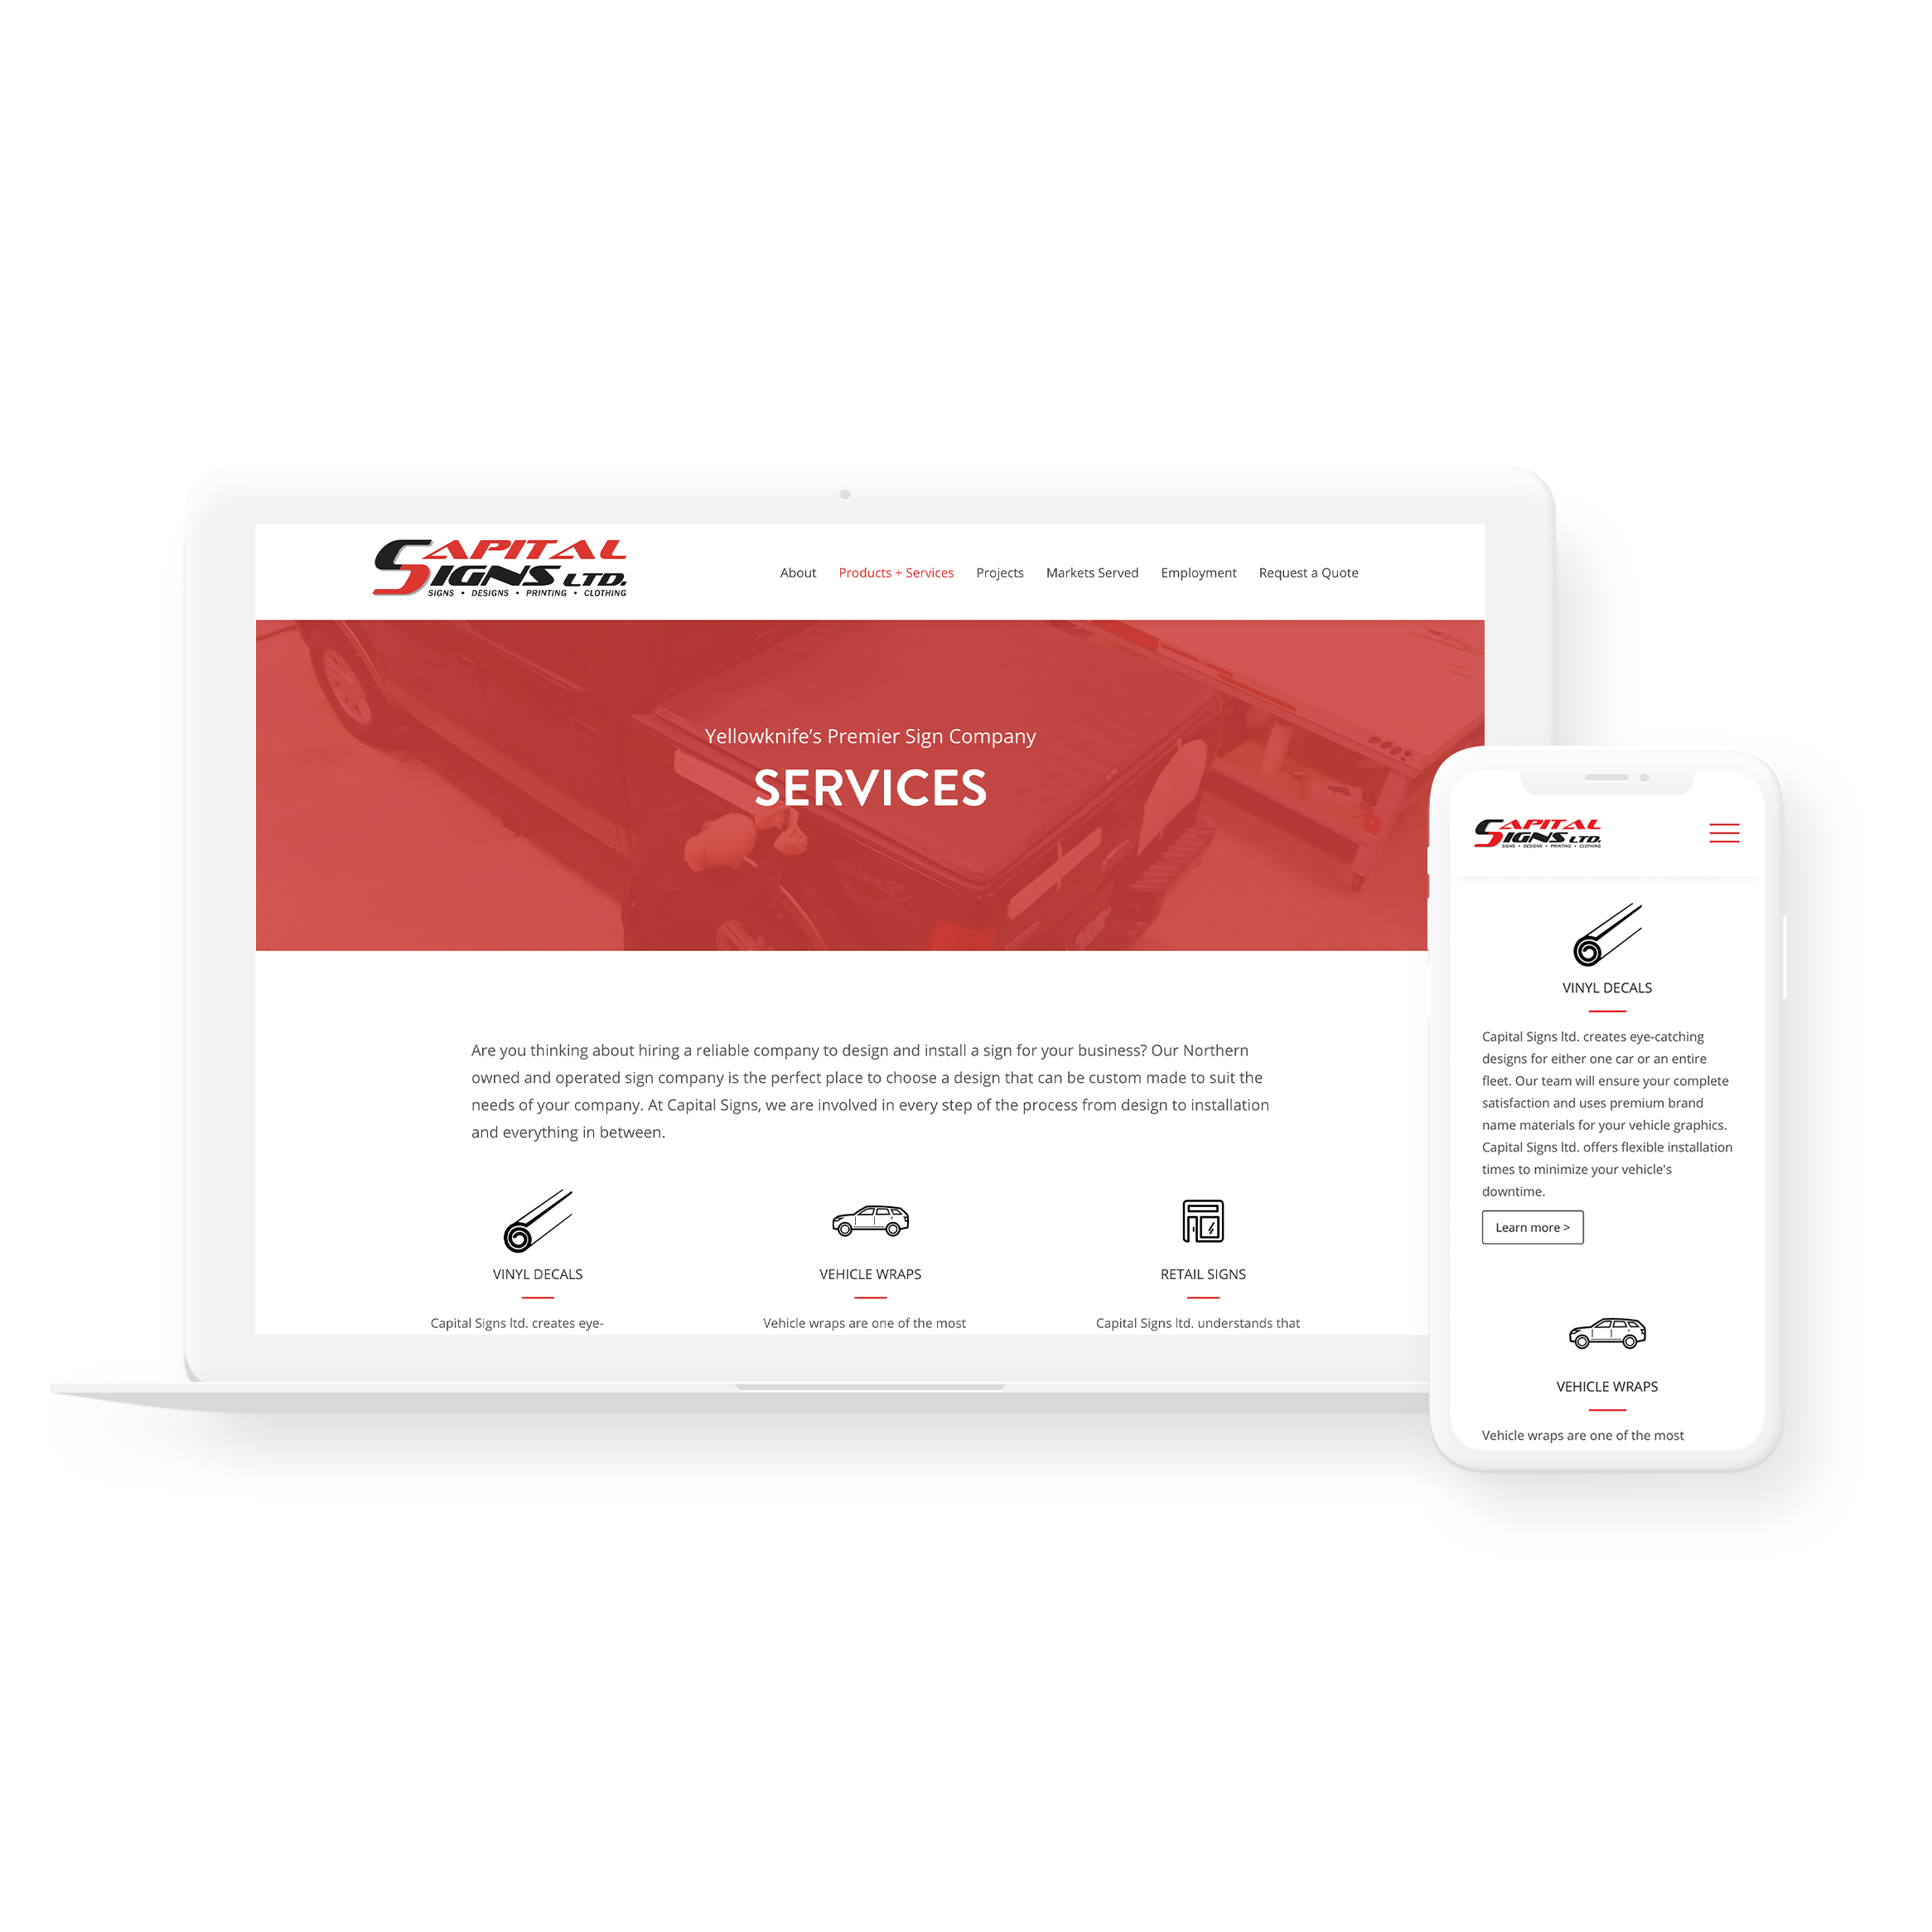 Sample image of website design showing desktop and mobile versions for Capital Signs